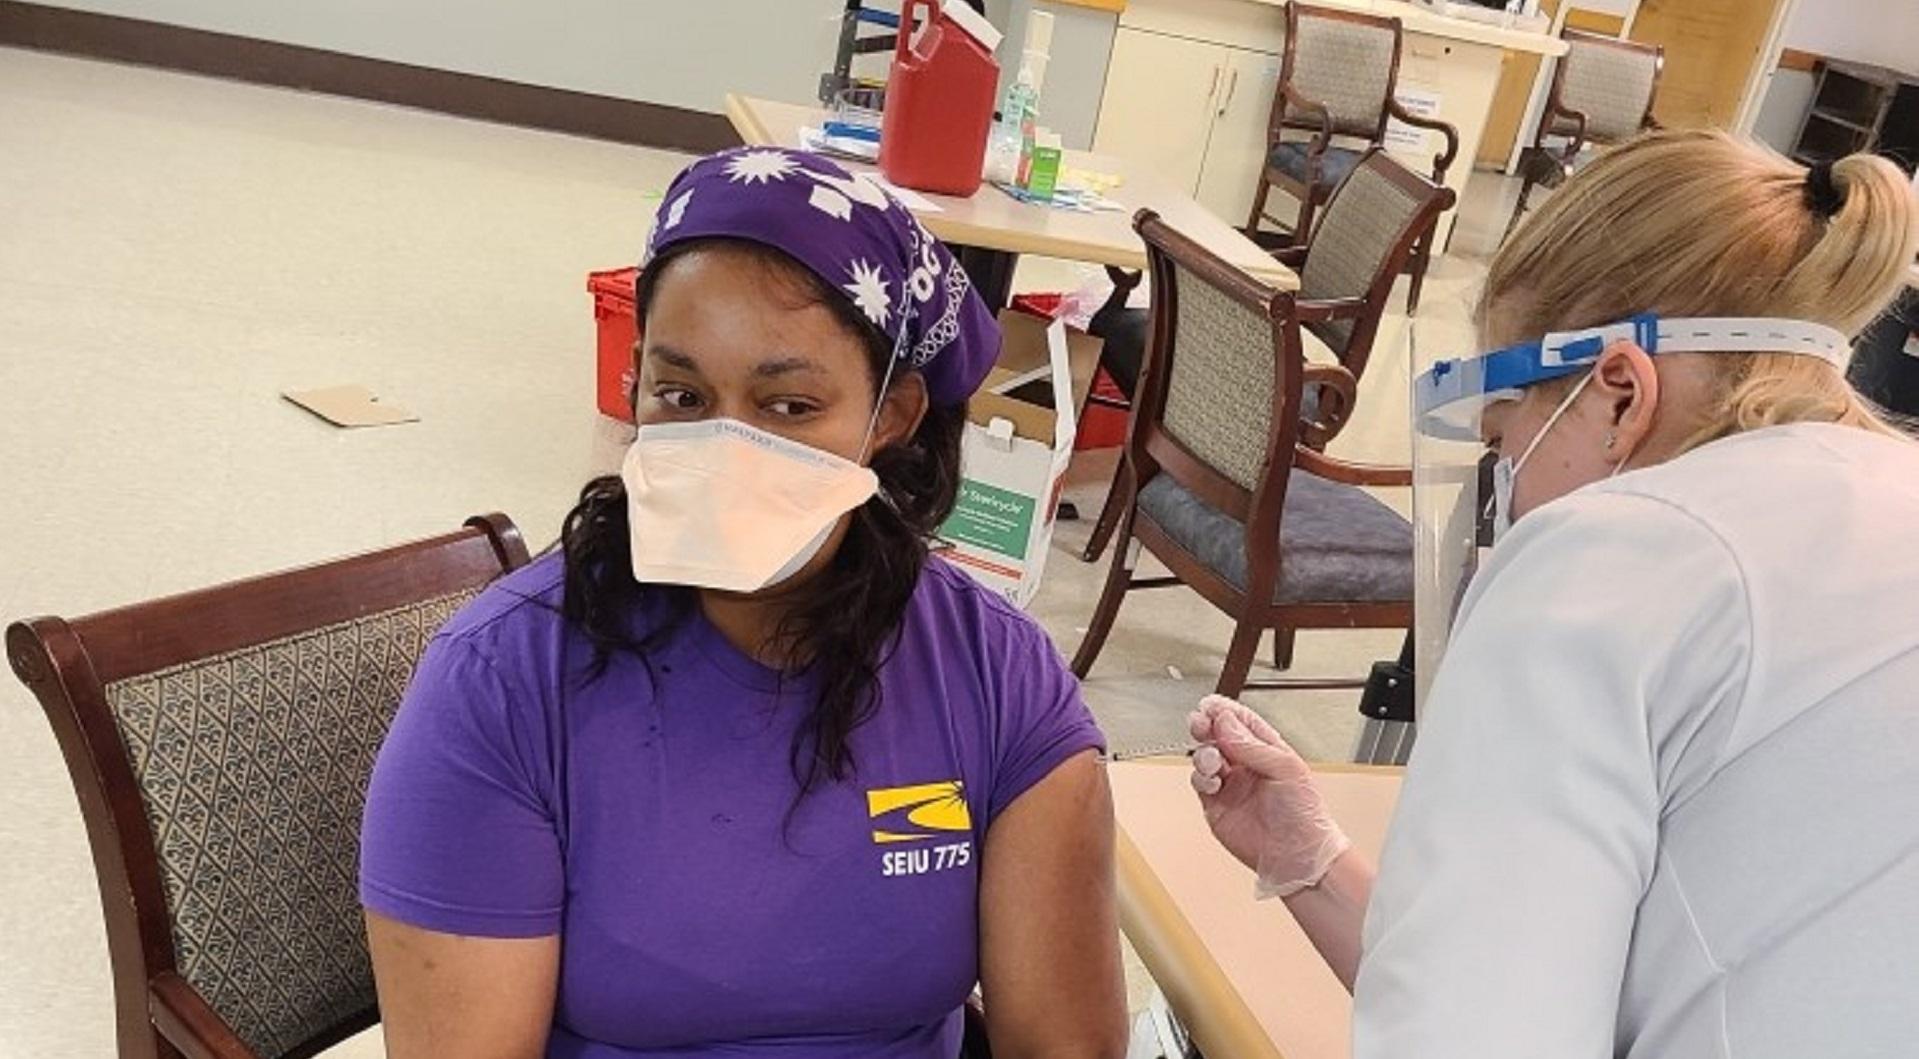 SEIU 775 caregiver receives the COVID-19 vaccine